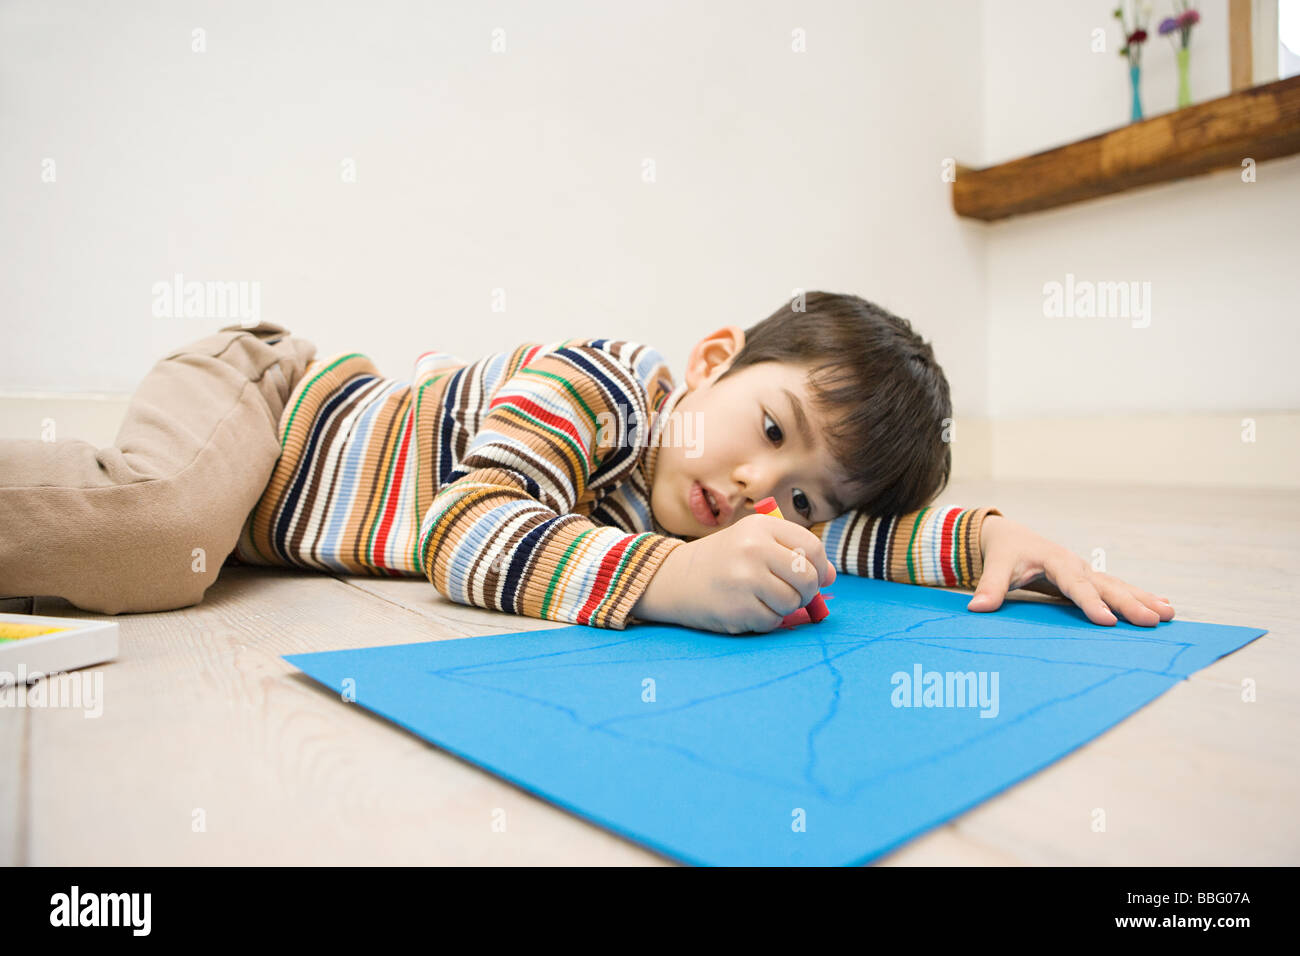 Boy holding a crayon - Stock Image